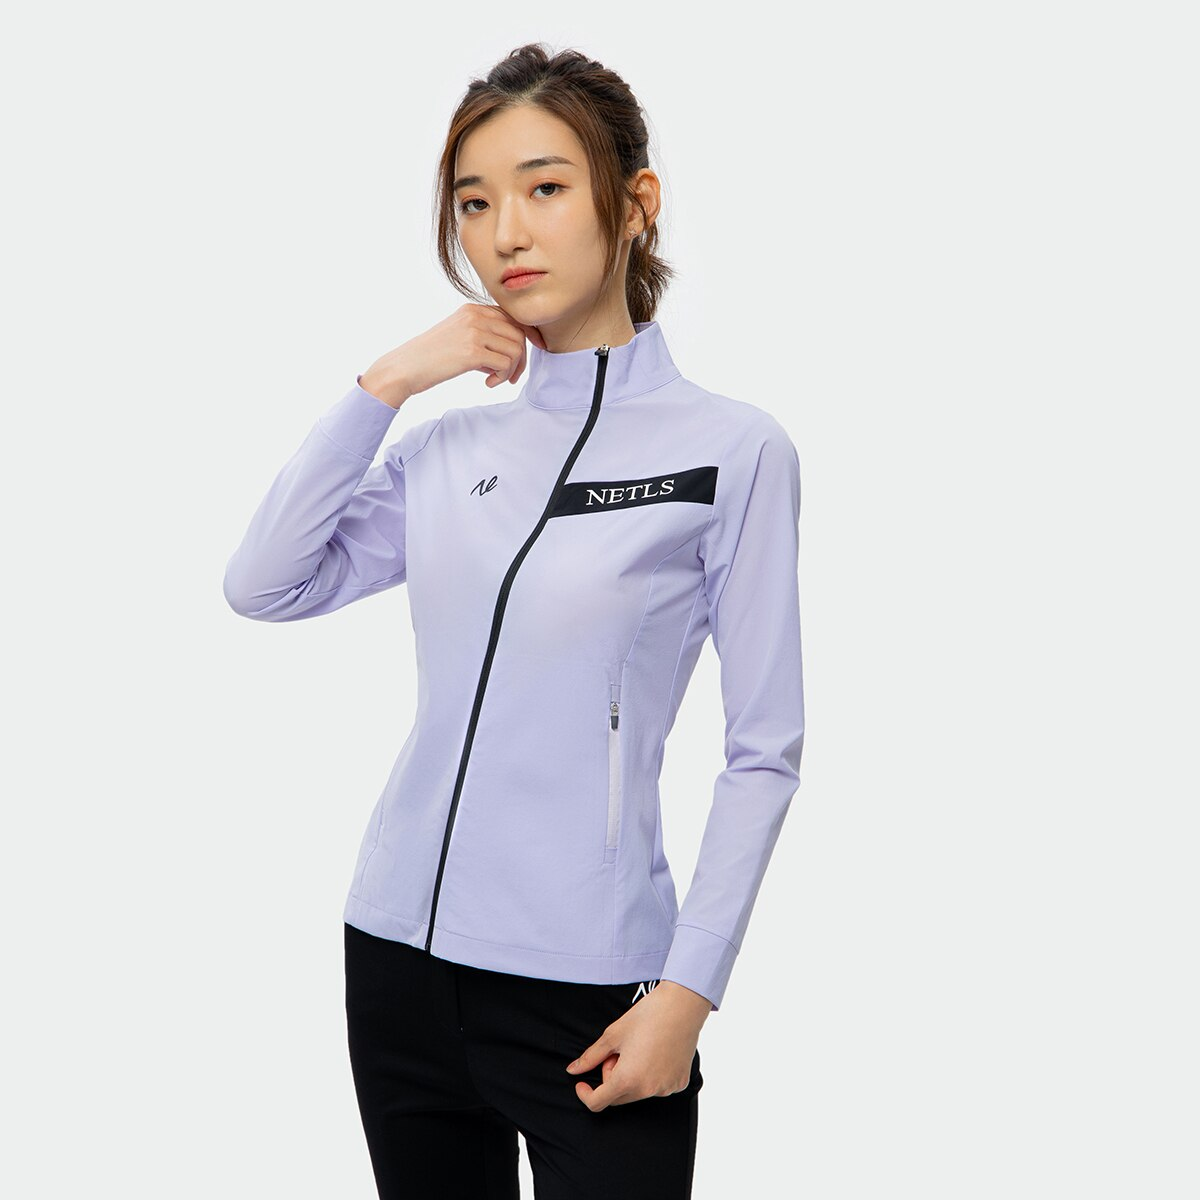 Autumn ladies golf sports jacket, fashionable style with diagonal zipper,golf wear for women